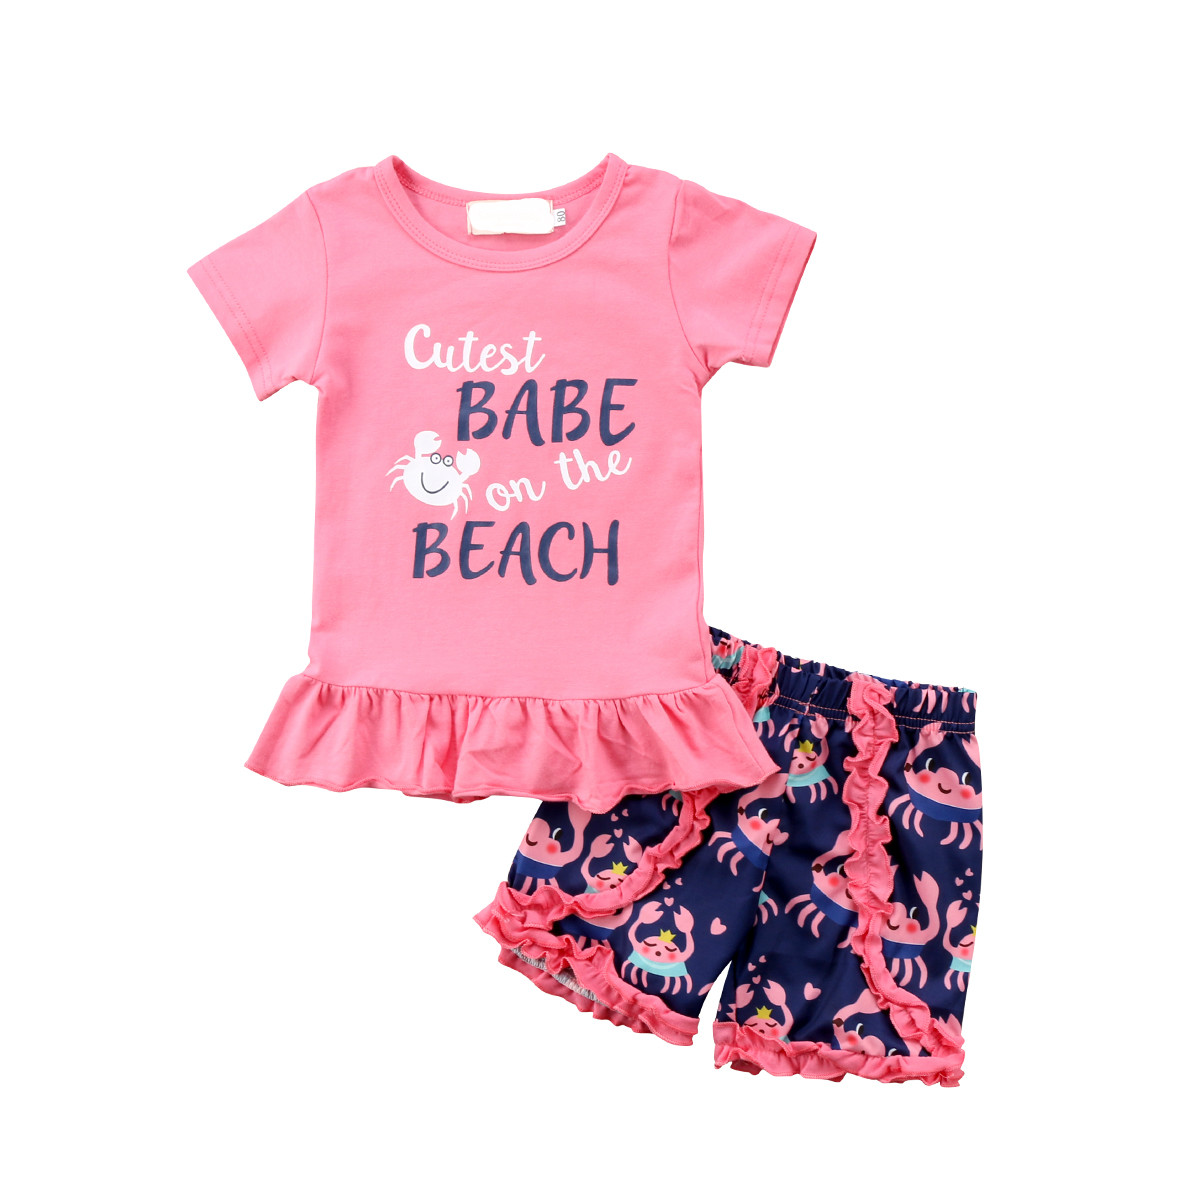 2018 Lovely Newborn Baby Infant Toddled Cartoon Outfits Ruffles T-Shirt Tops Short Pants Summer Children New Clothes Set